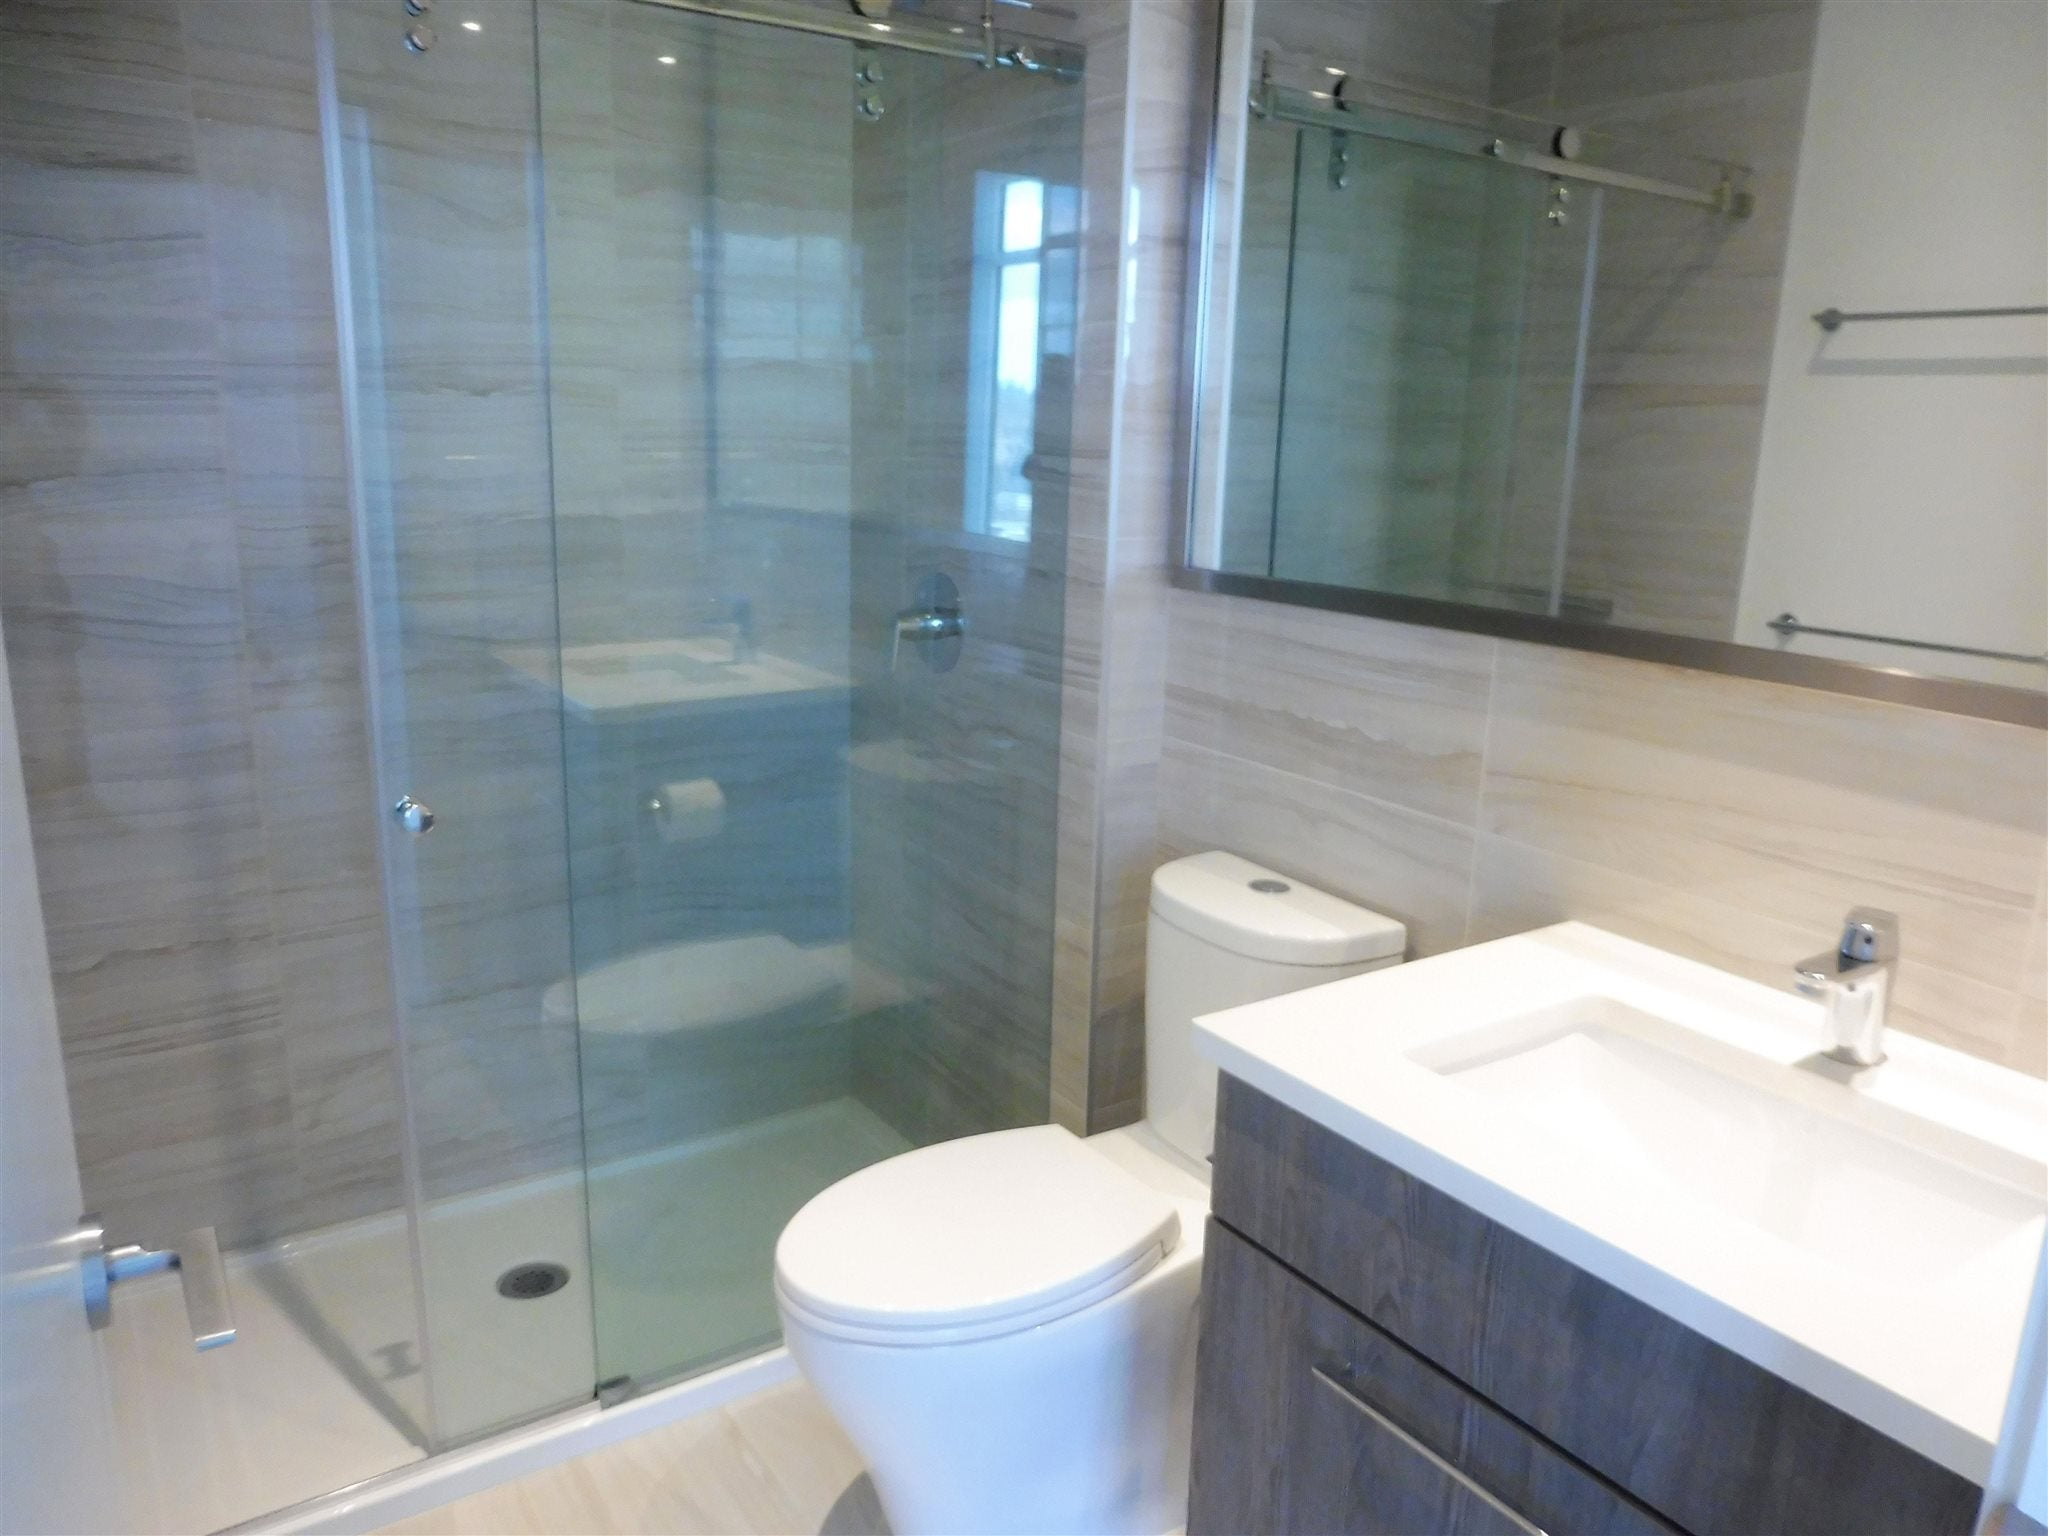 1409 691 NORTH ROAD - Coquitlam West Apartment/Condo for sale, 2 Bedrooms (R2604155) - #12